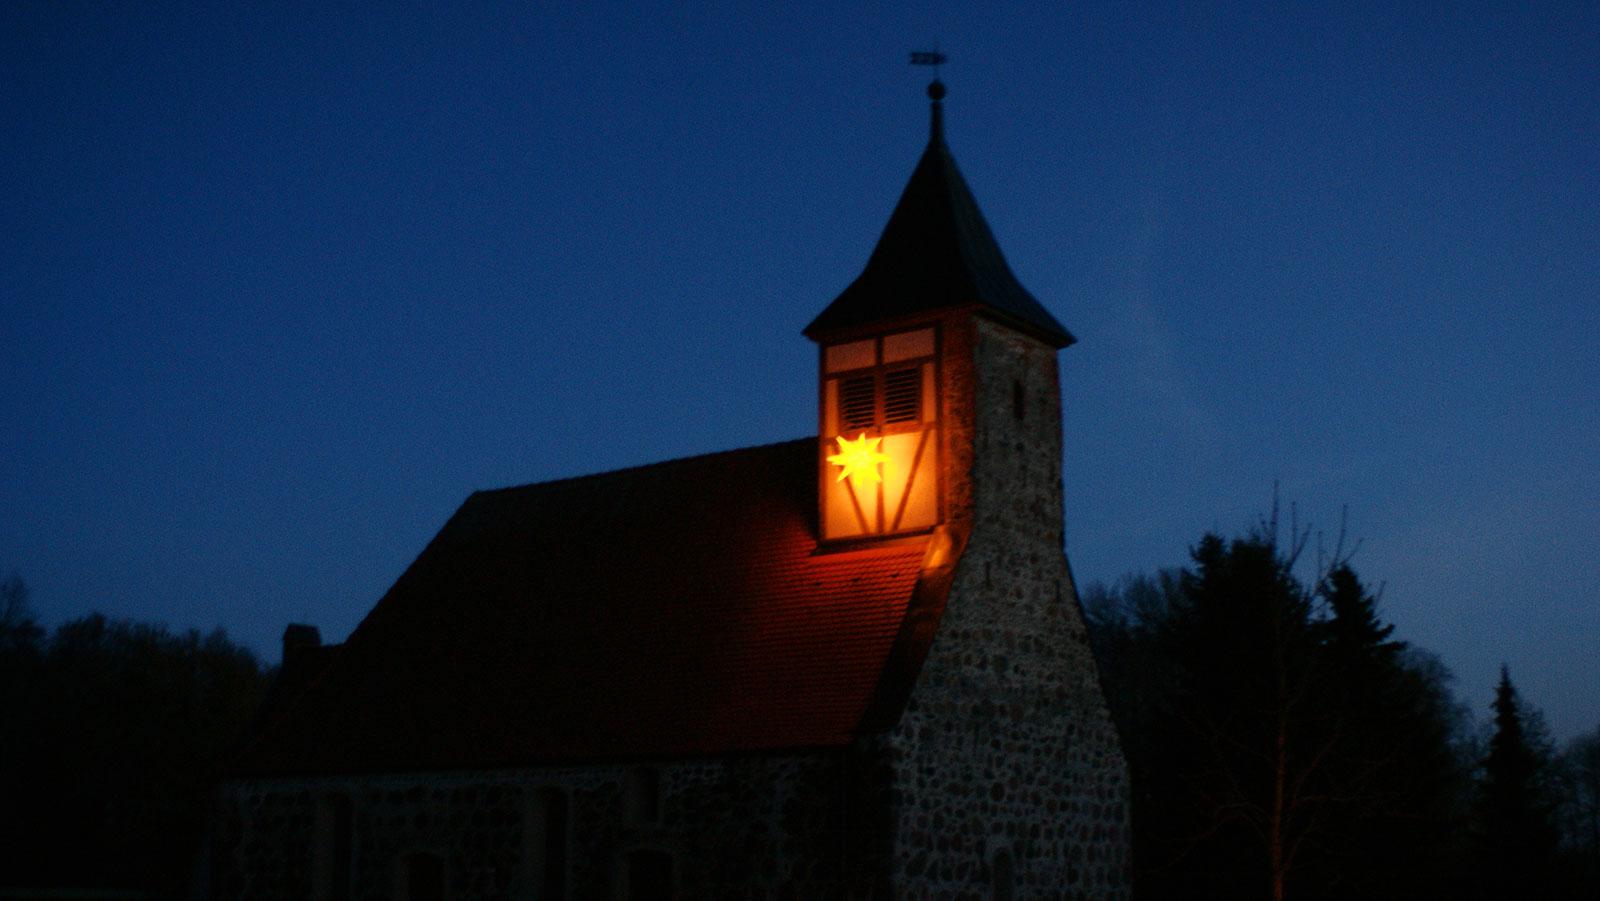 Adventsstern an der Gömnigker Kirche Dezember 2018